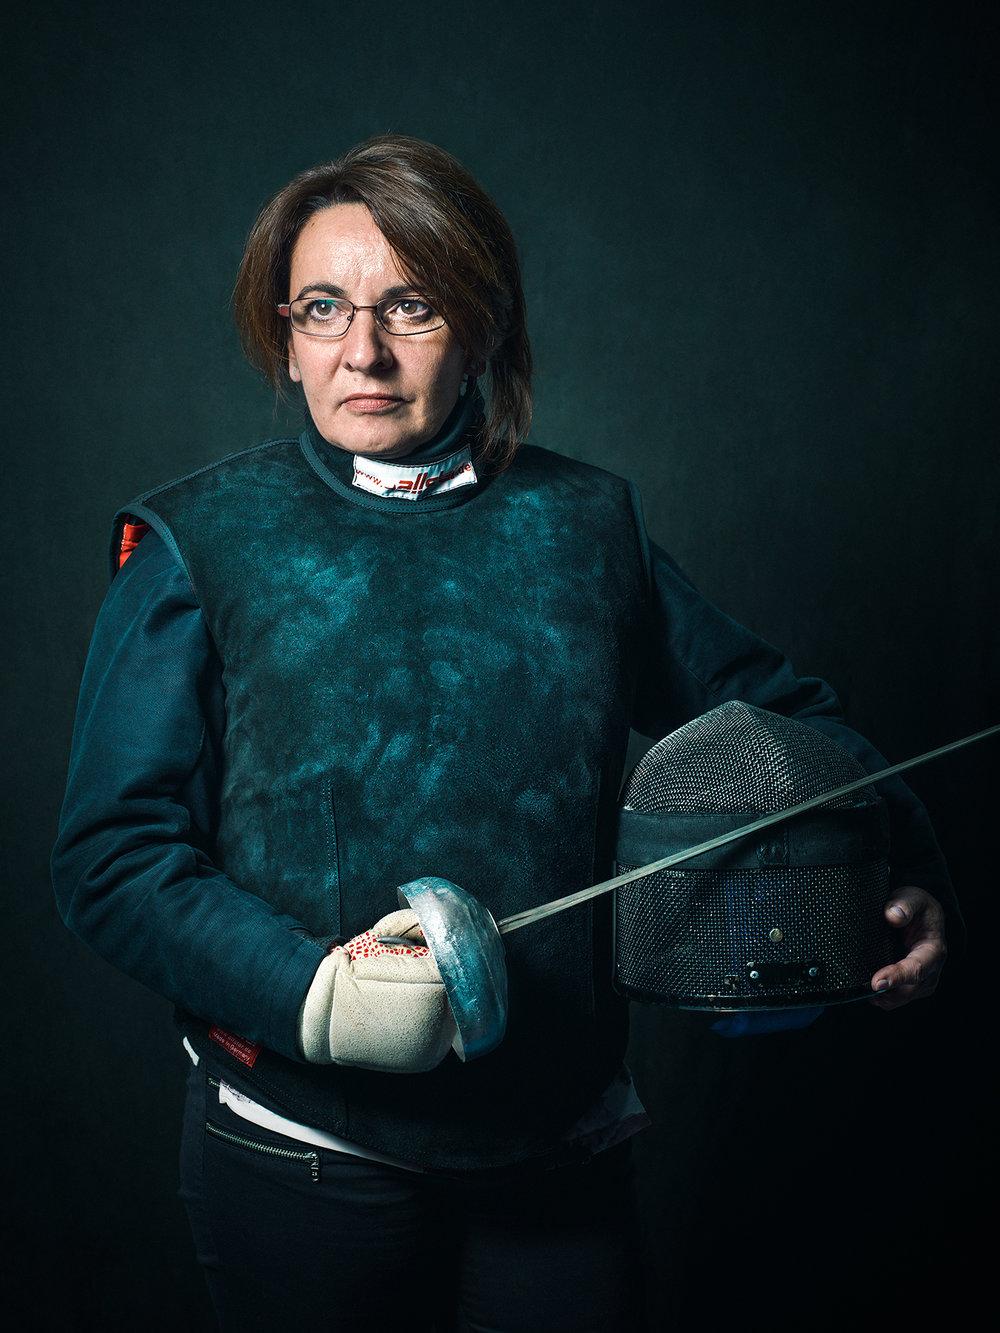 Oscar-arribas-esgrima-maestro-fencing-master-fencer-fechten-scherma-escrime-portrait-fotografo-retrato-photographer015.jpg